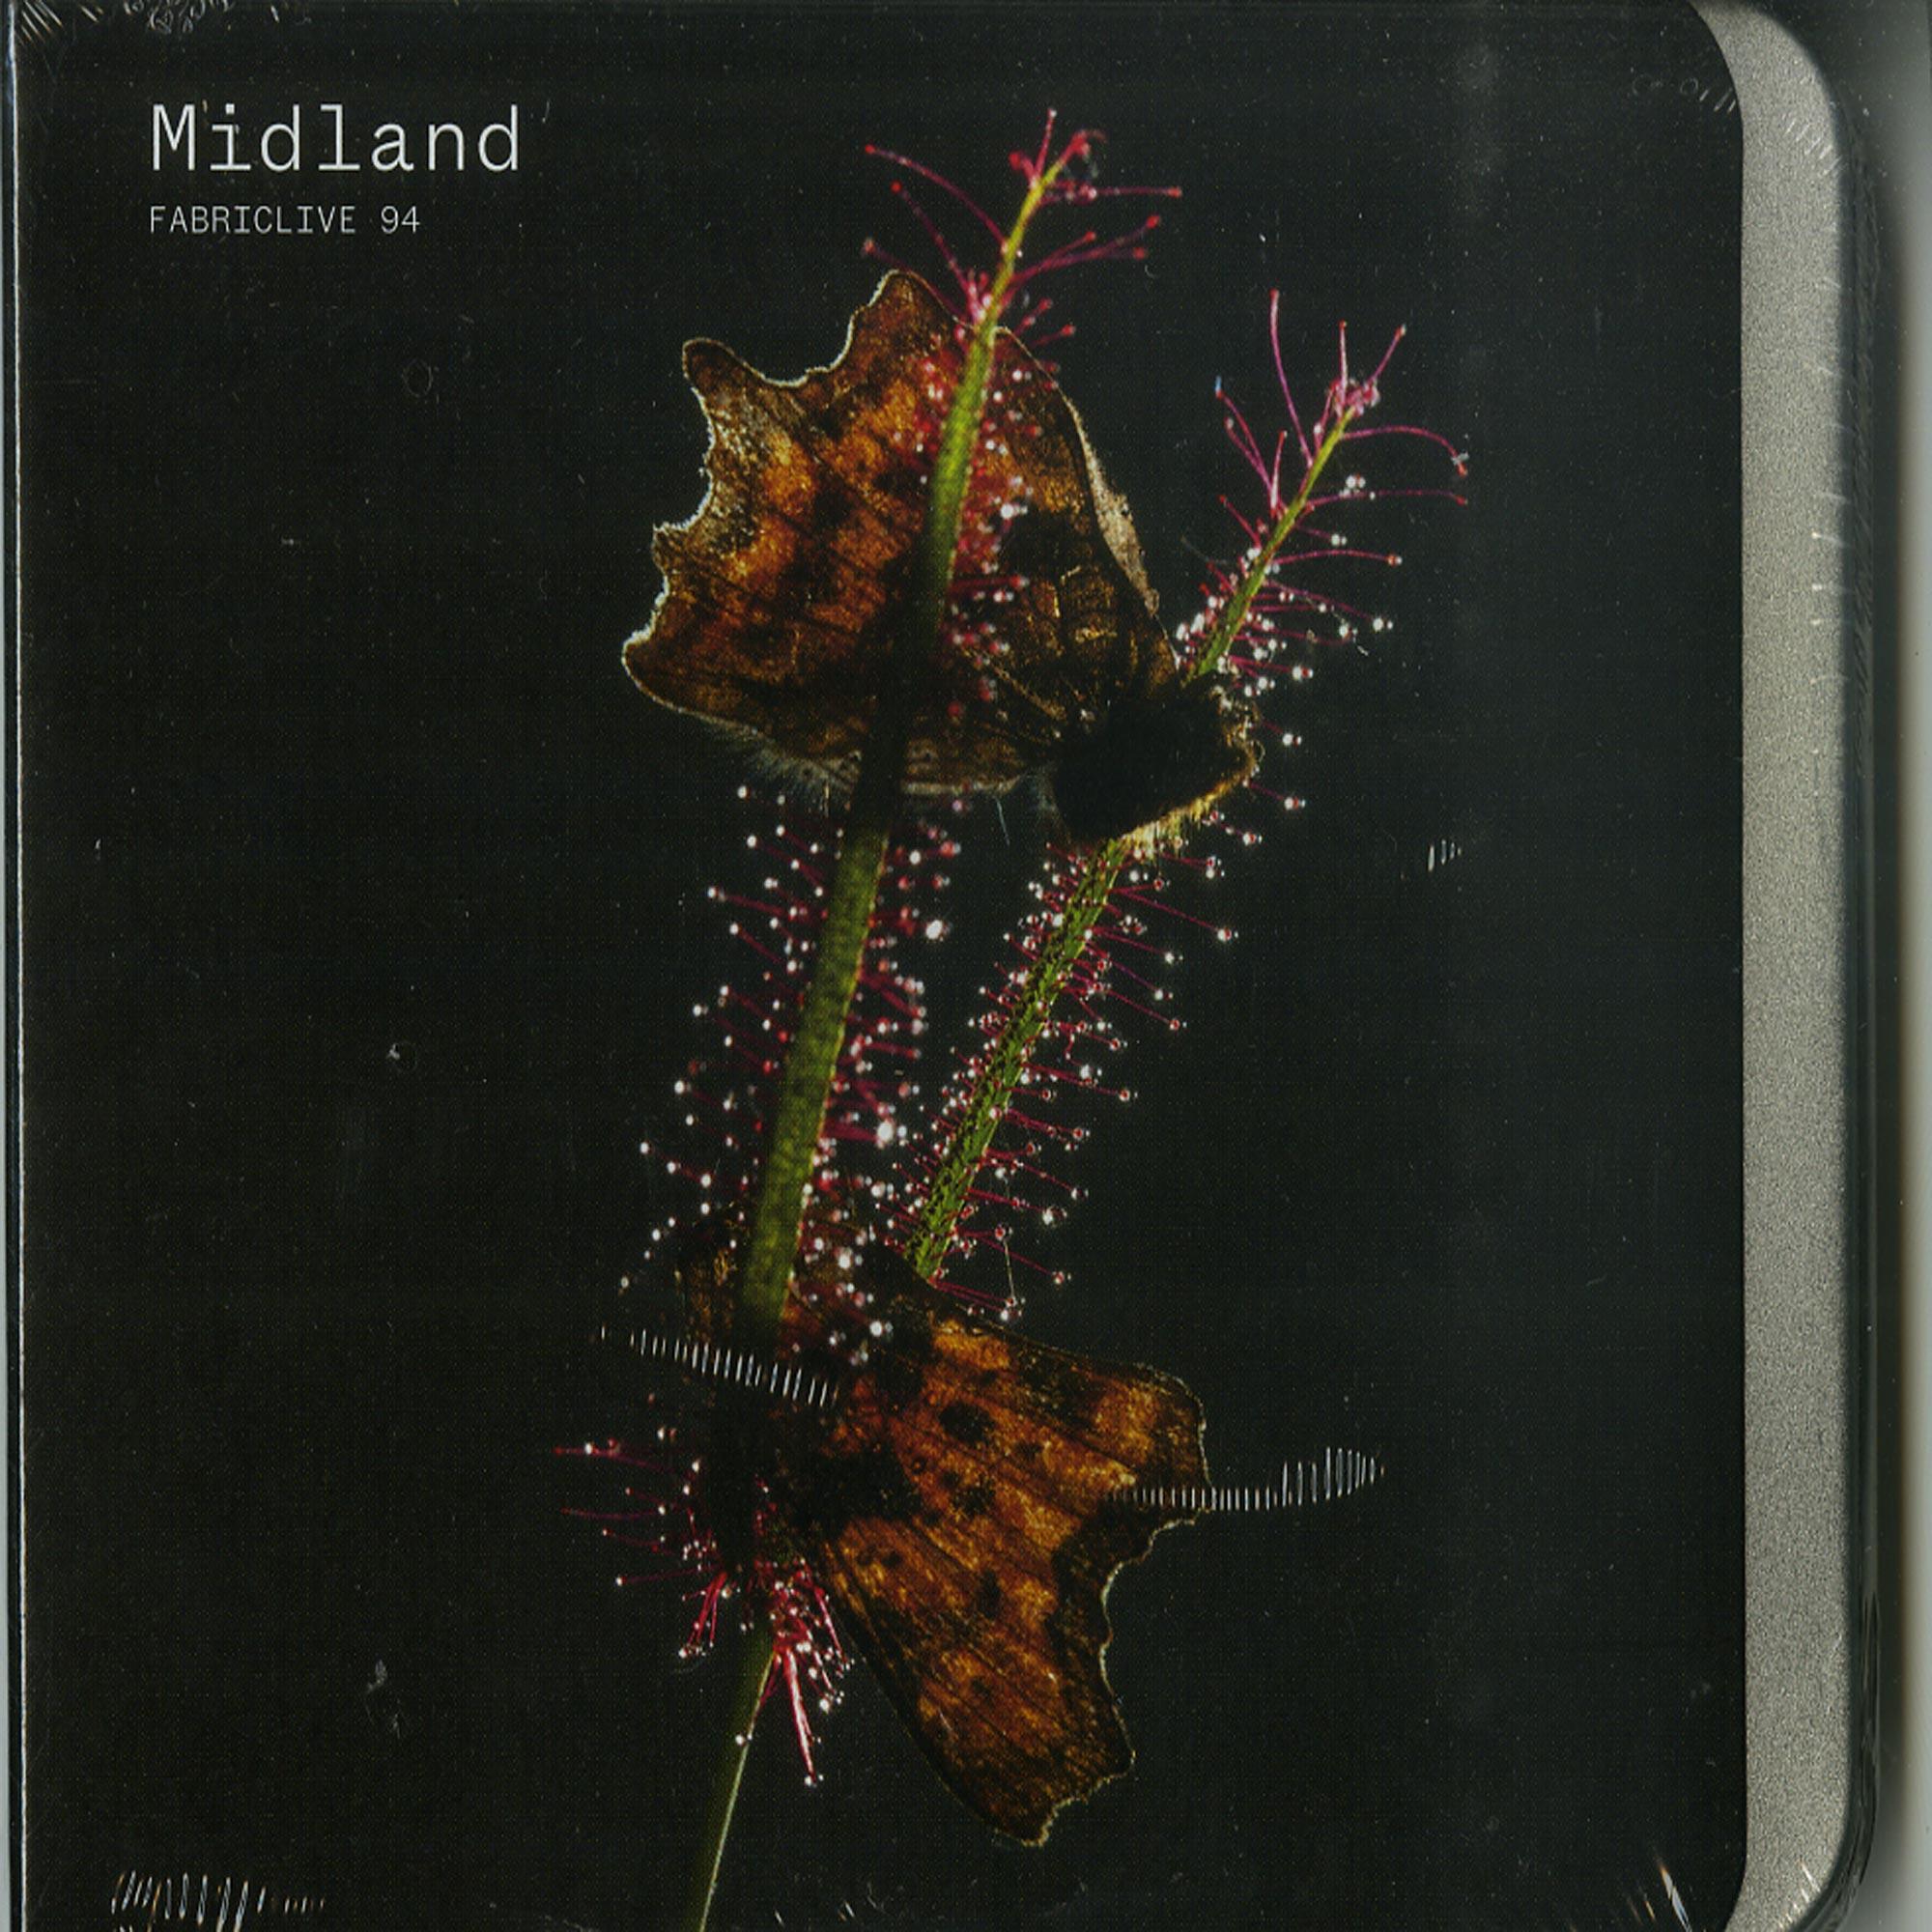 Midland - FABRIC LIVE 94